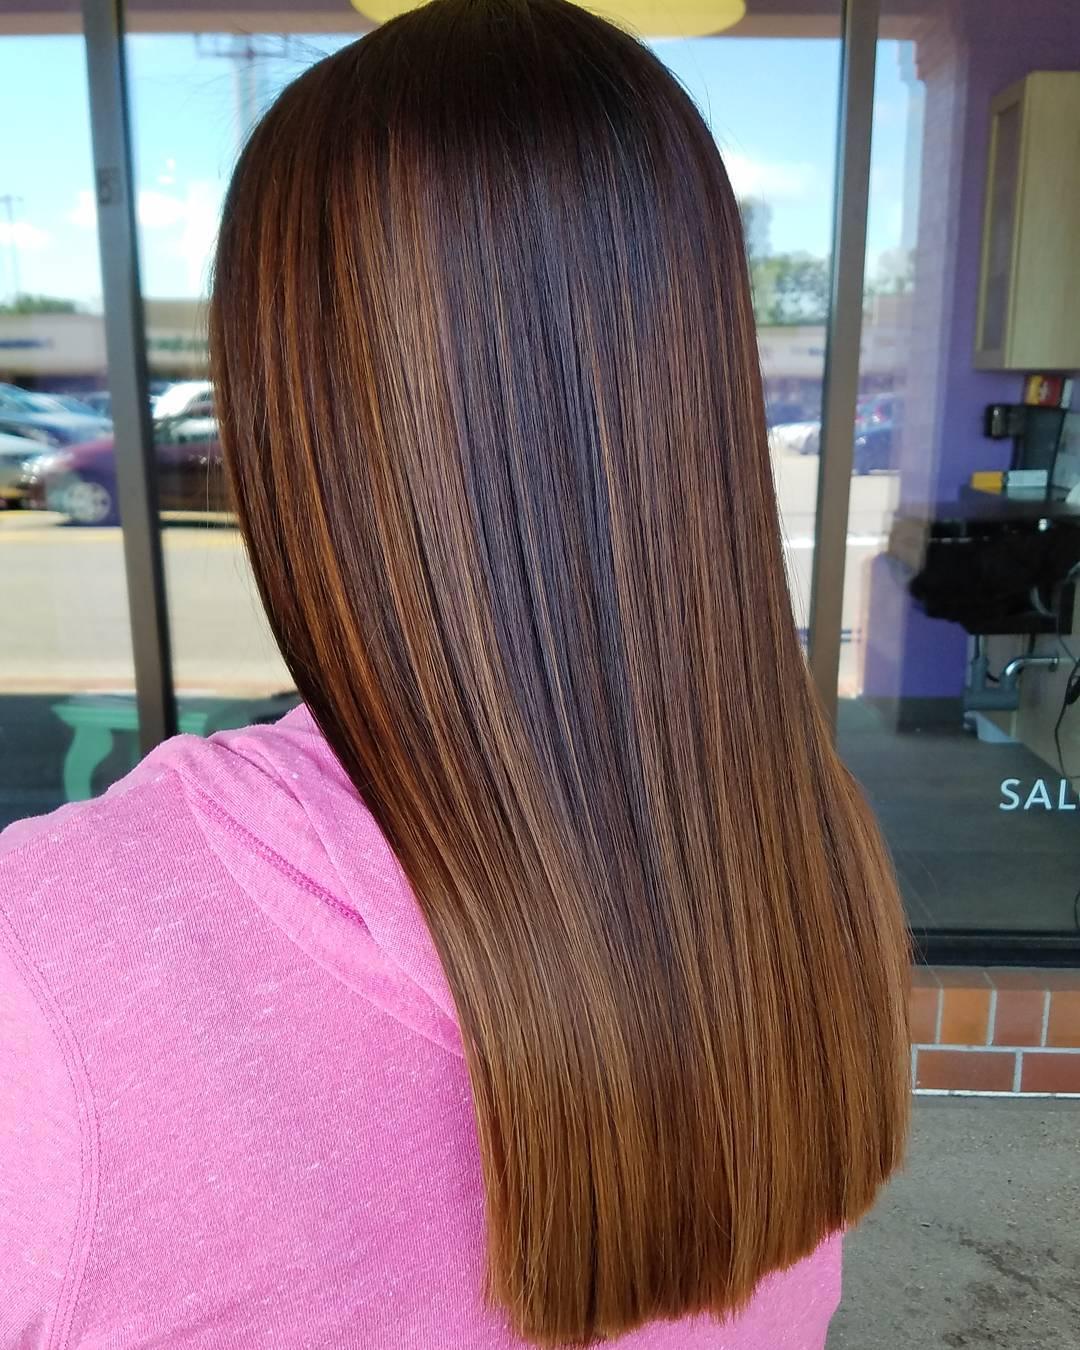 Caramel balayage on dark straight hair